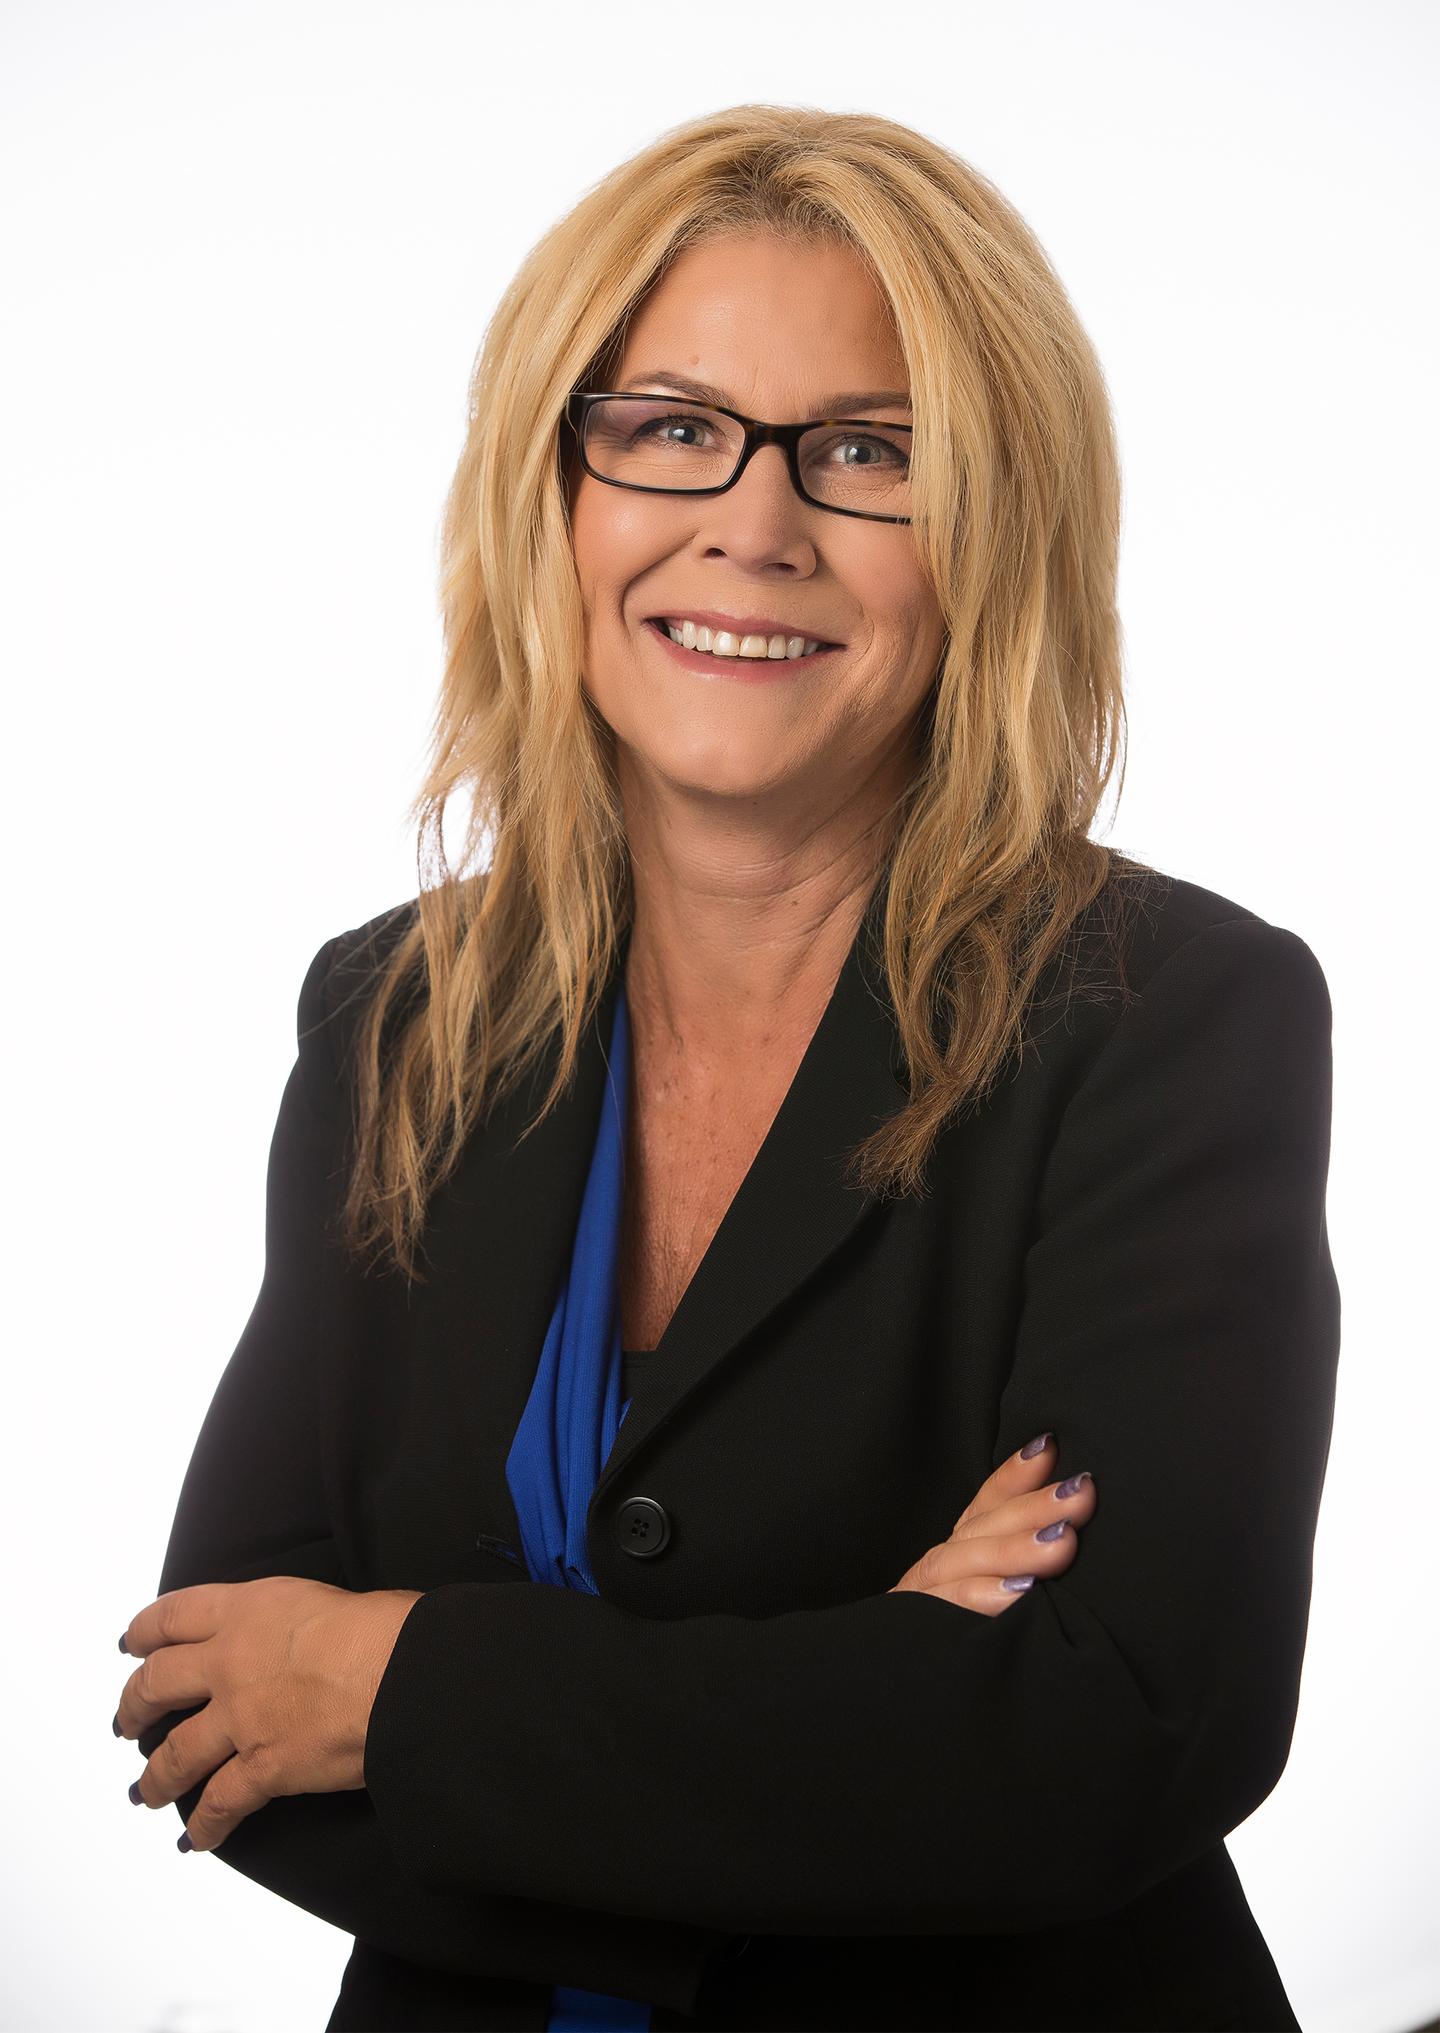 Tami Strickland, Director of Sales, Key Accounts, ALOM